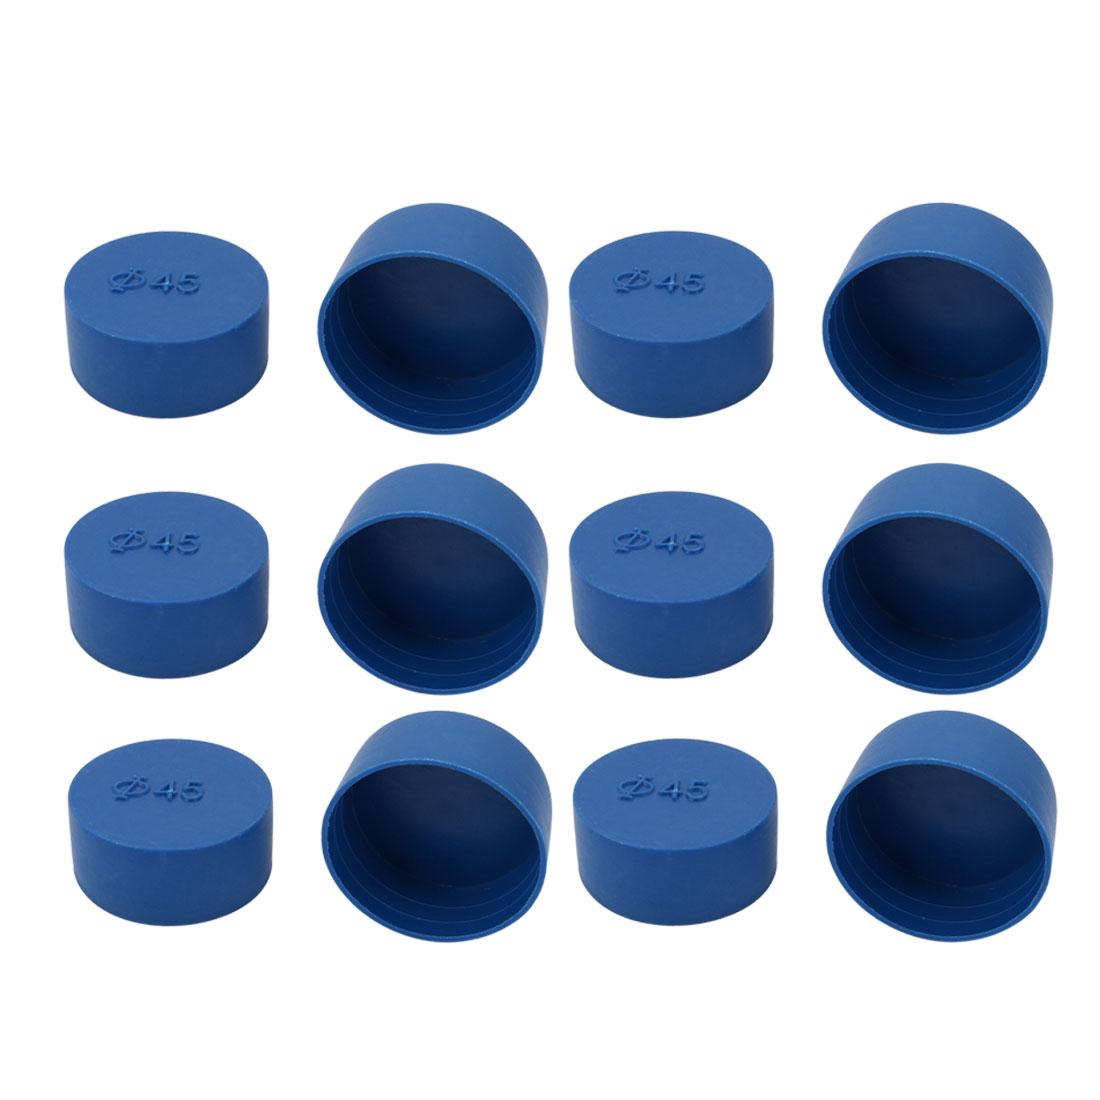 12pcs 45mm Inner Dia PE Plastic End Cap Bolt Thread Protector Tube Cover Blue